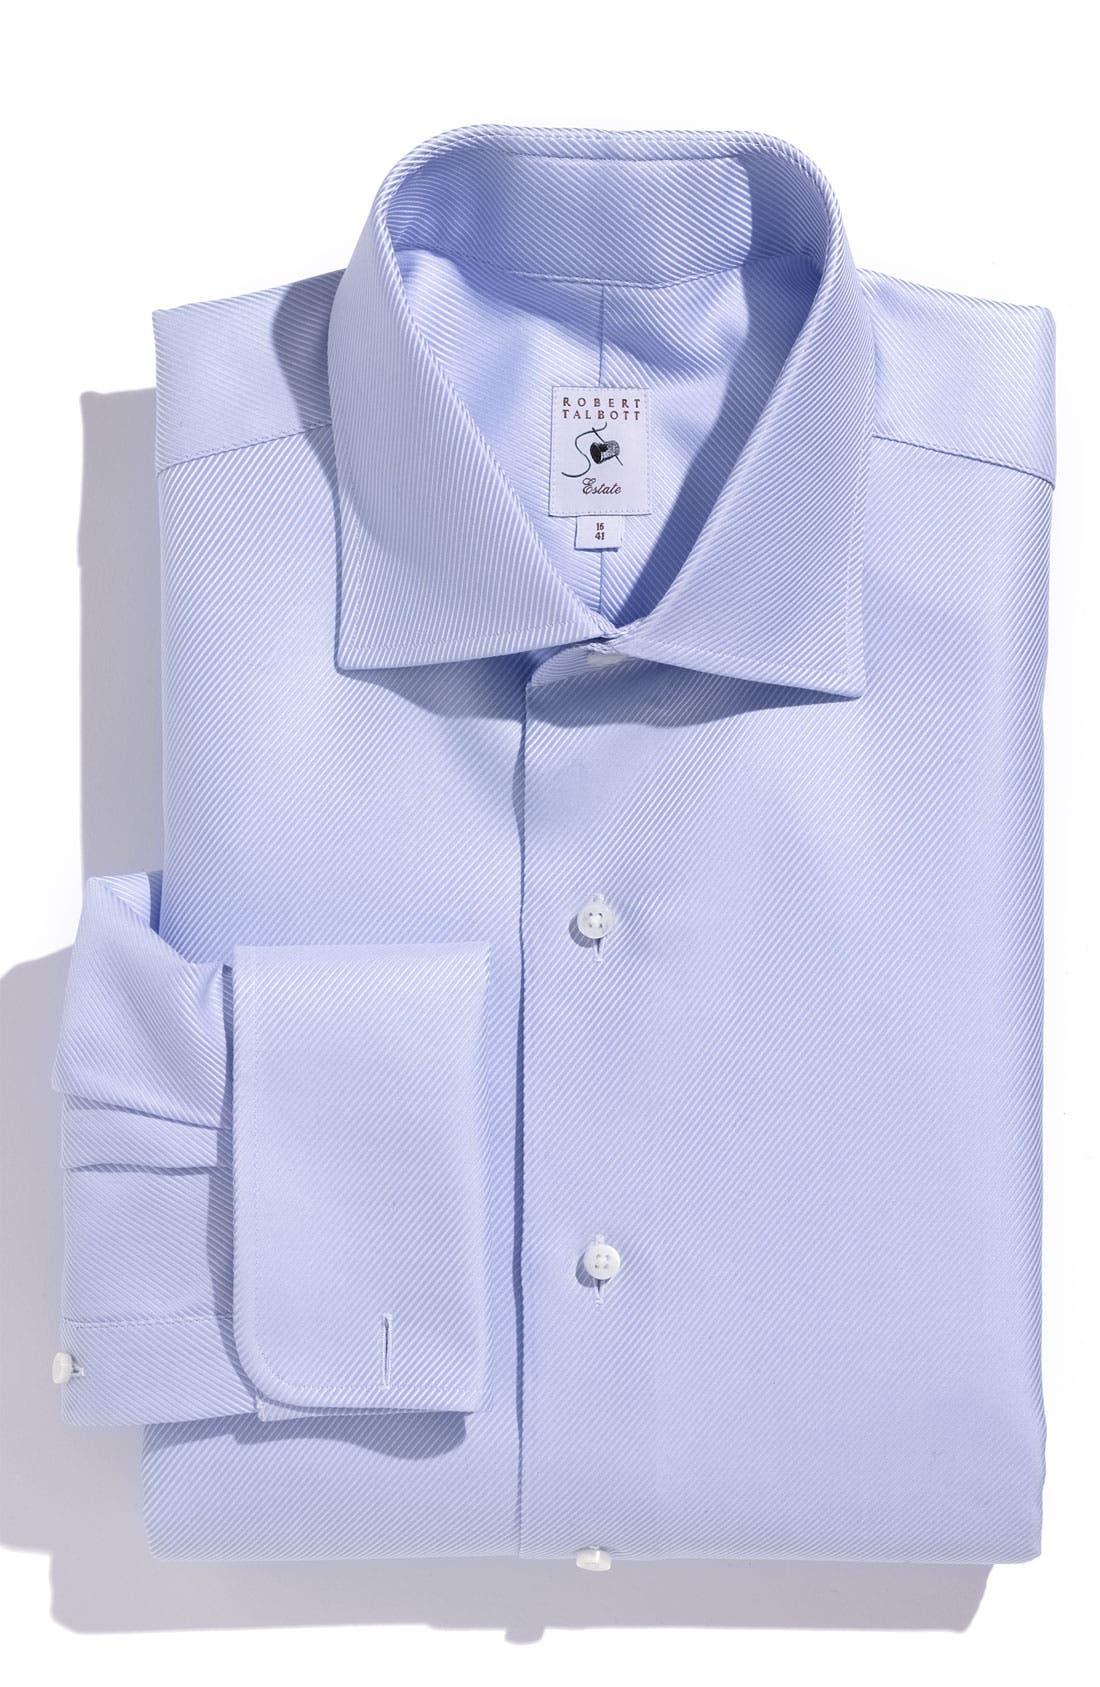 Main Image - Robert Talbott Regular Fit Estate Dress Shirt (Online Exclusive)